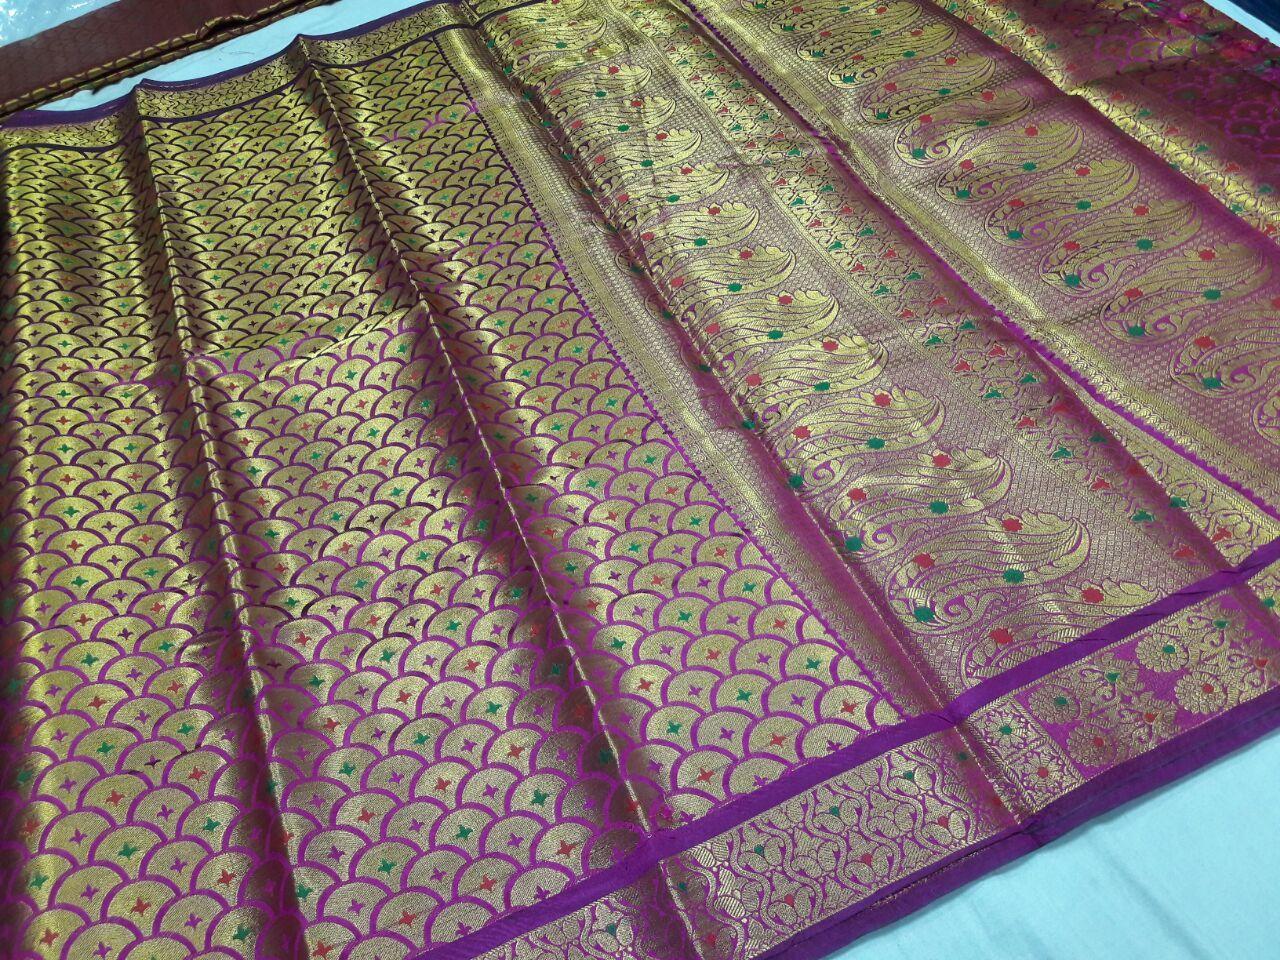 Kanchipuram Brocket Umbrella Meena Sarees